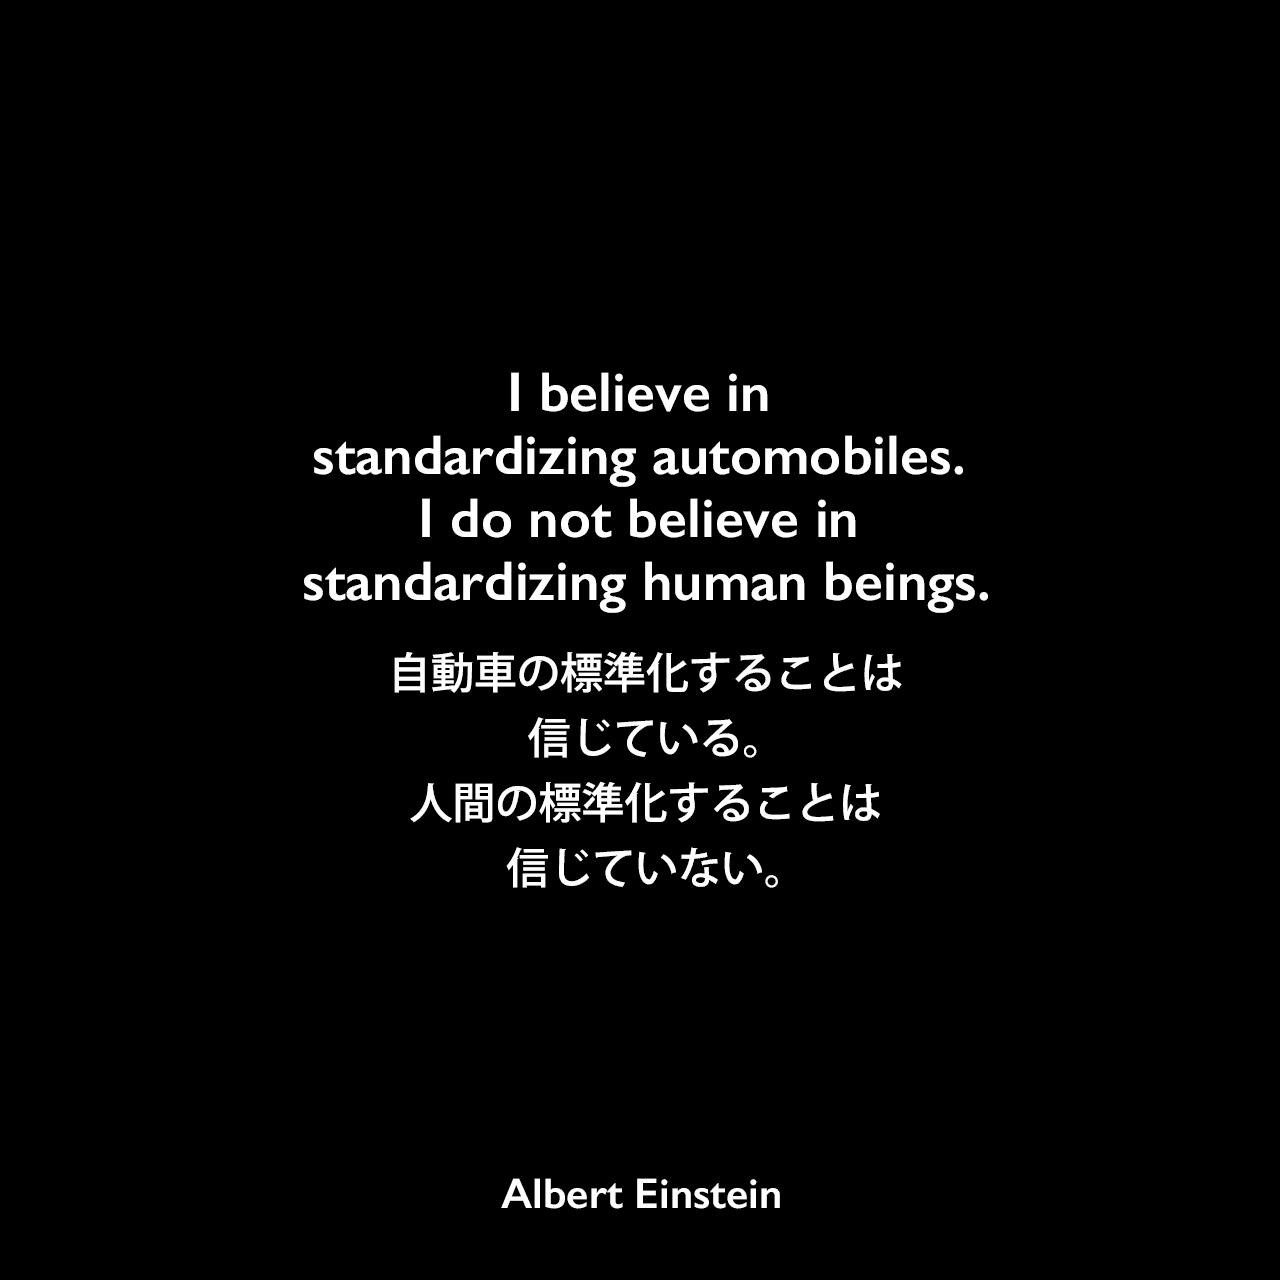 I believe in standardizing automobiles. I do not believe in standardizing human beings.自動車の標準化することは信じている。人間の標準化することは信じていない。- ジョージ・シルヴェスター・ヴィエレックとのインタビュー(1929年)よりAlbert Einstein